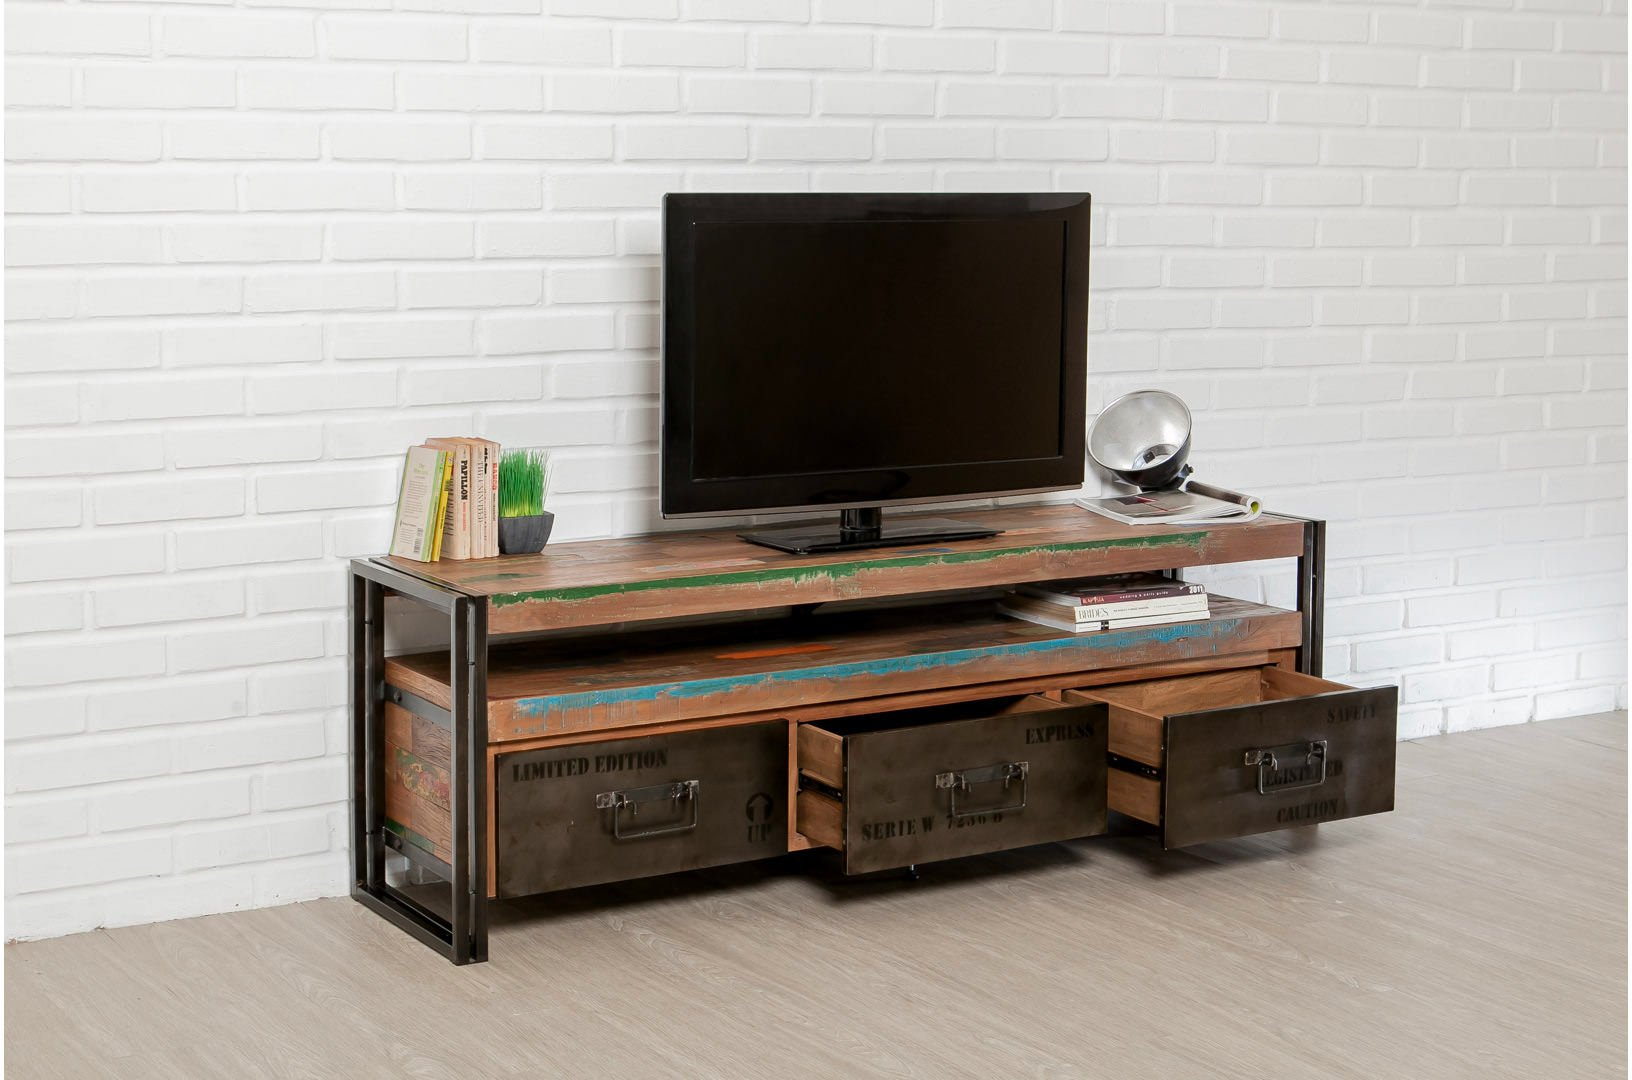 meuble tv loft 1 tag re 3 tiroirs teck recycl delorm. Black Bedroom Furniture Sets. Home Design Ideas